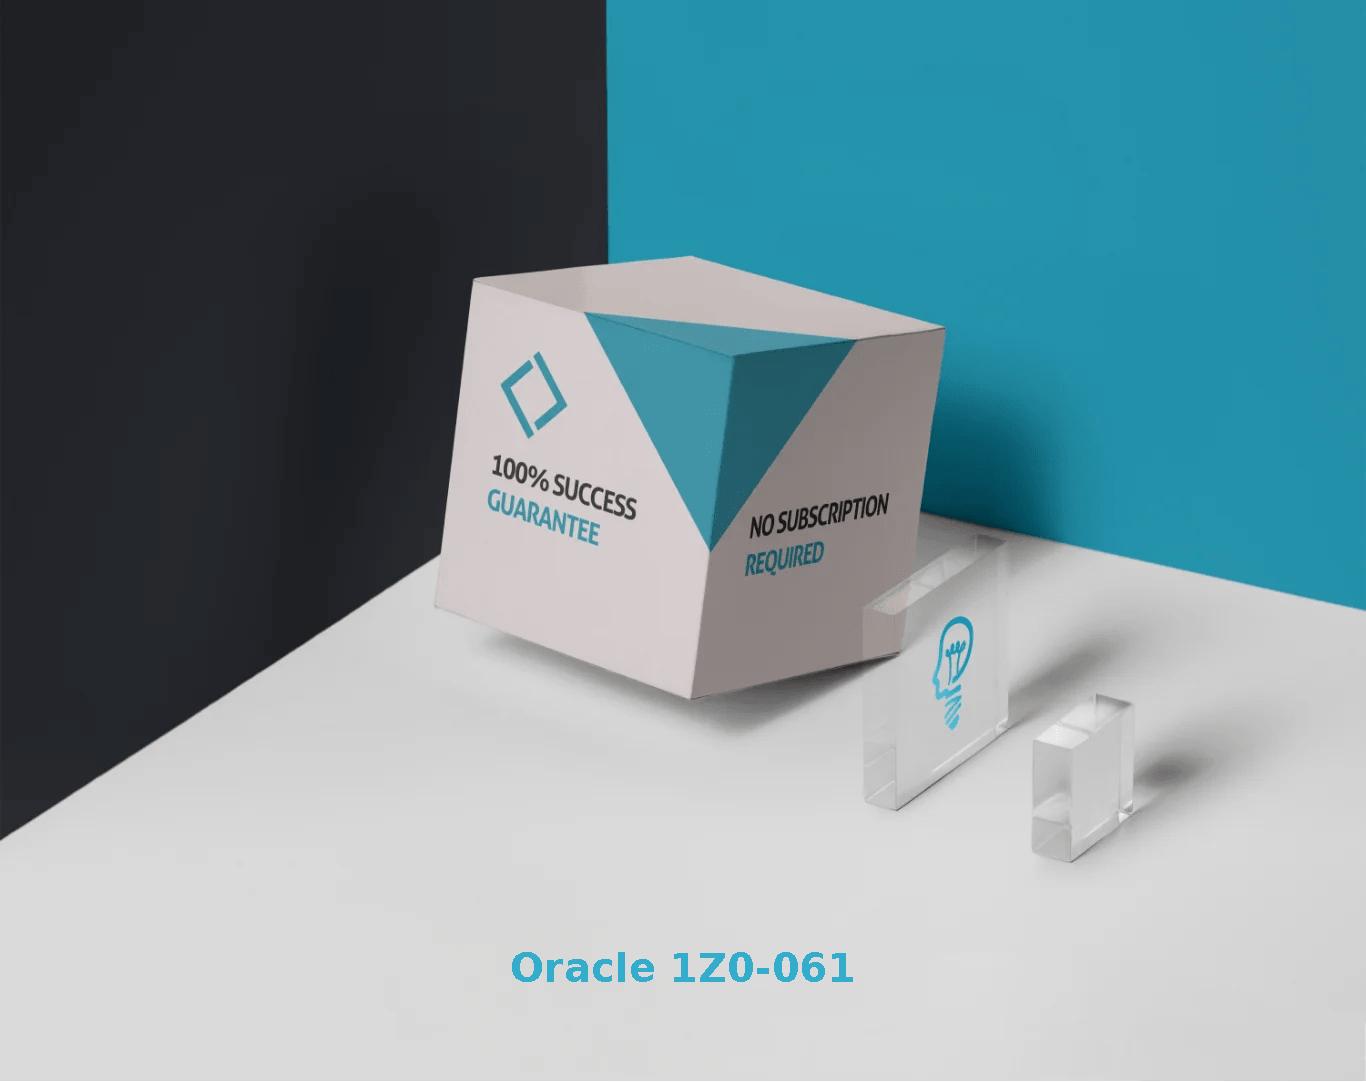 Oracle 1Z0-061 Exams